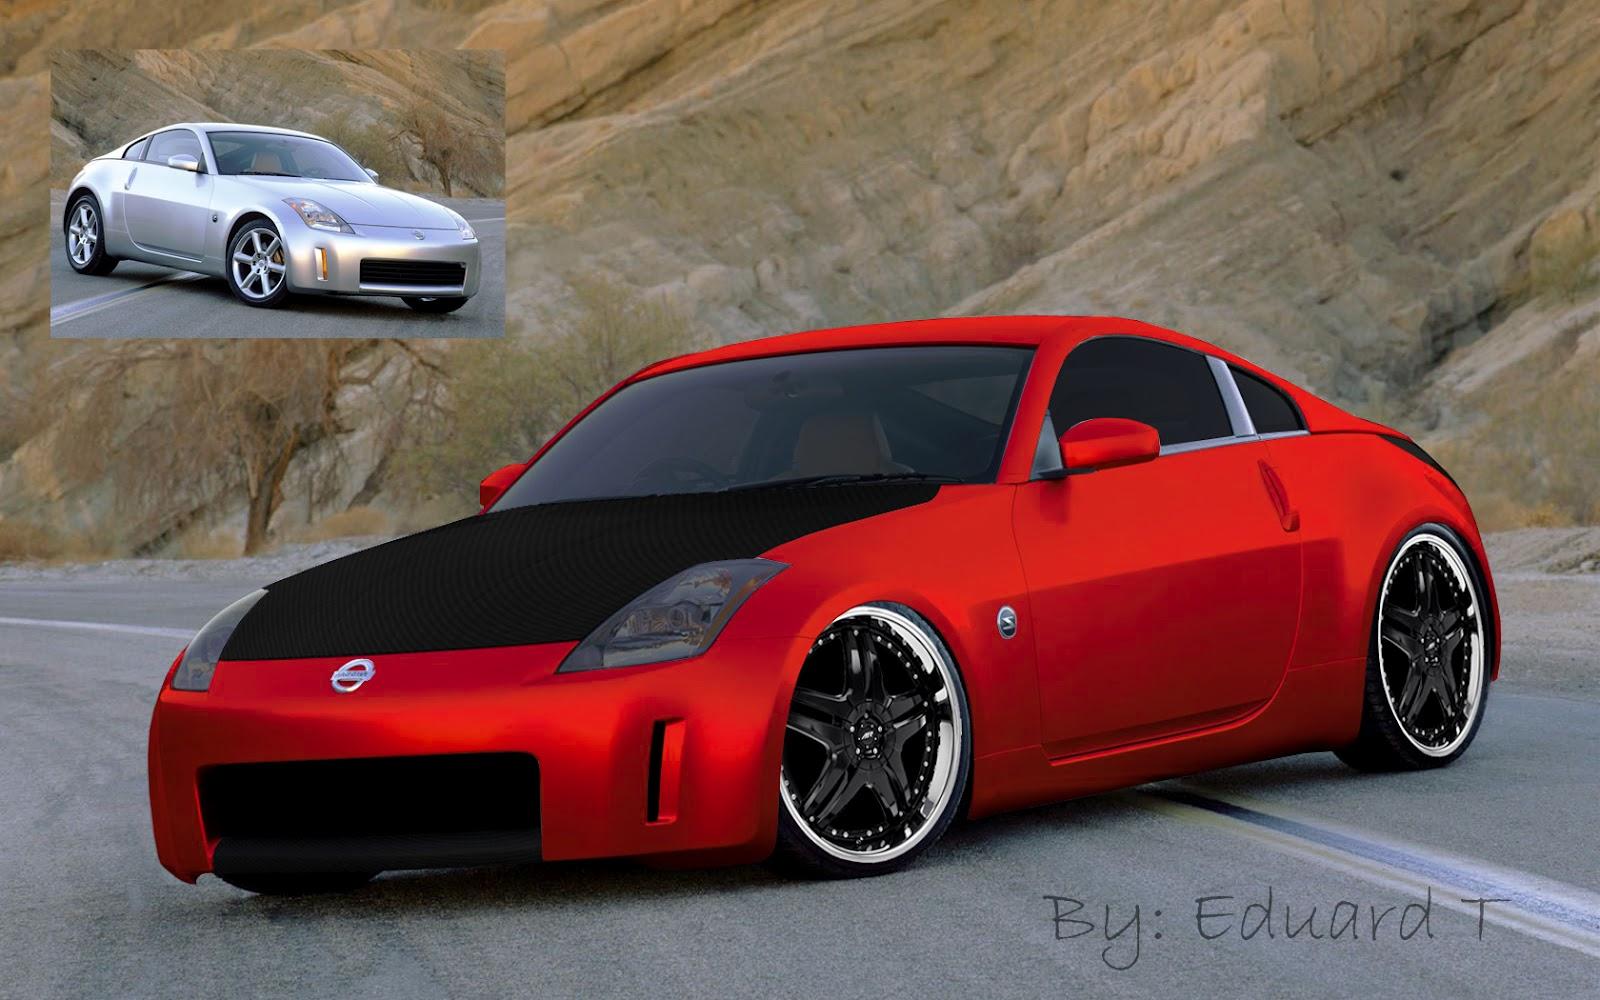 http://4.bp.blogspot.com/-zaZ-ATzJMv4/T-7MmAnDMvI/AAAAAAAAAD8/4zvTPpC-8jk/s1600/Nissan-350z-red.JPG